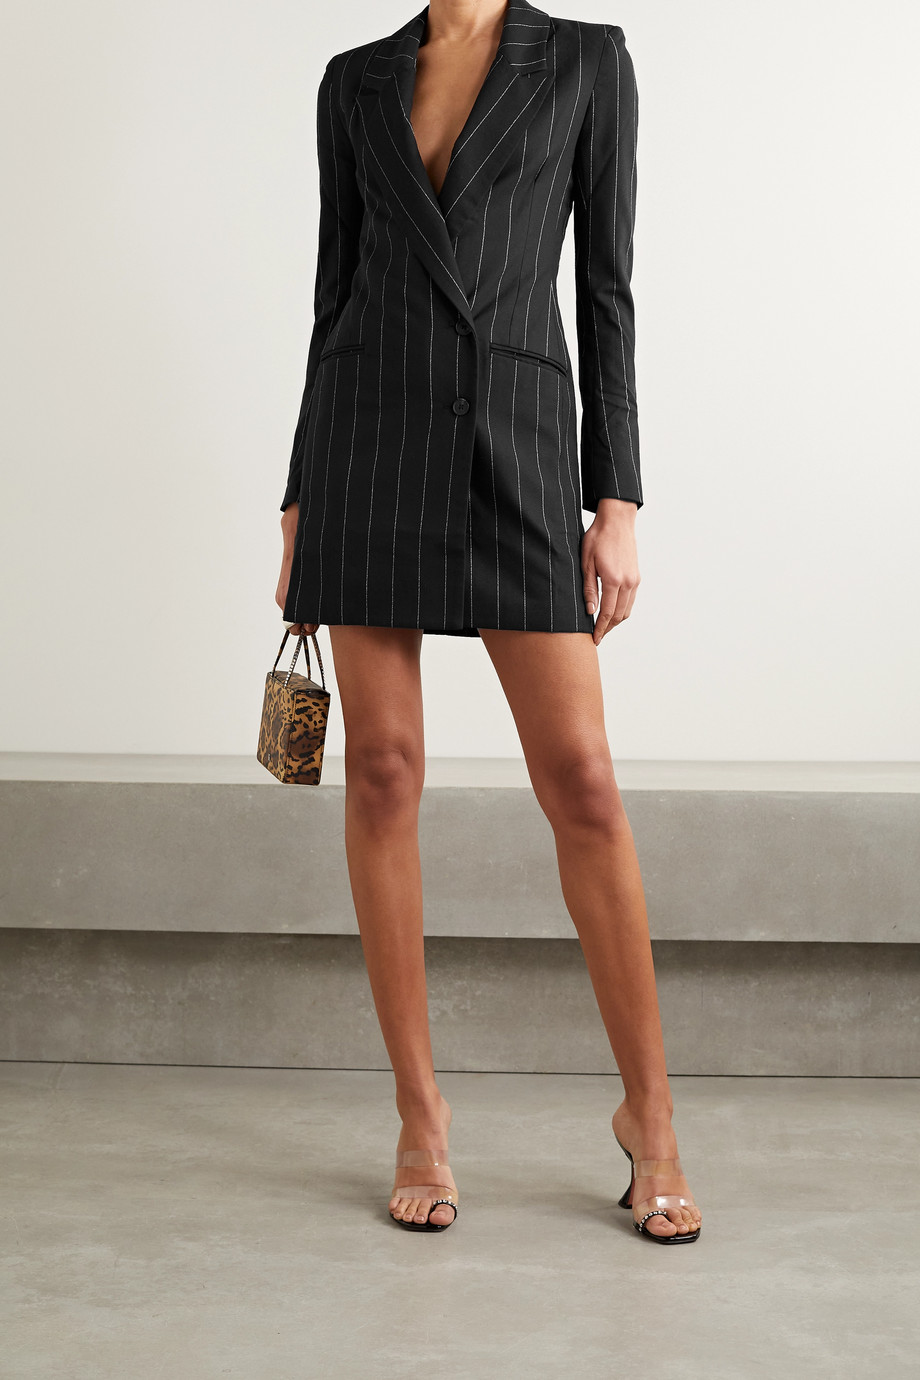 The Range Zoot pinstriped woven mini dress